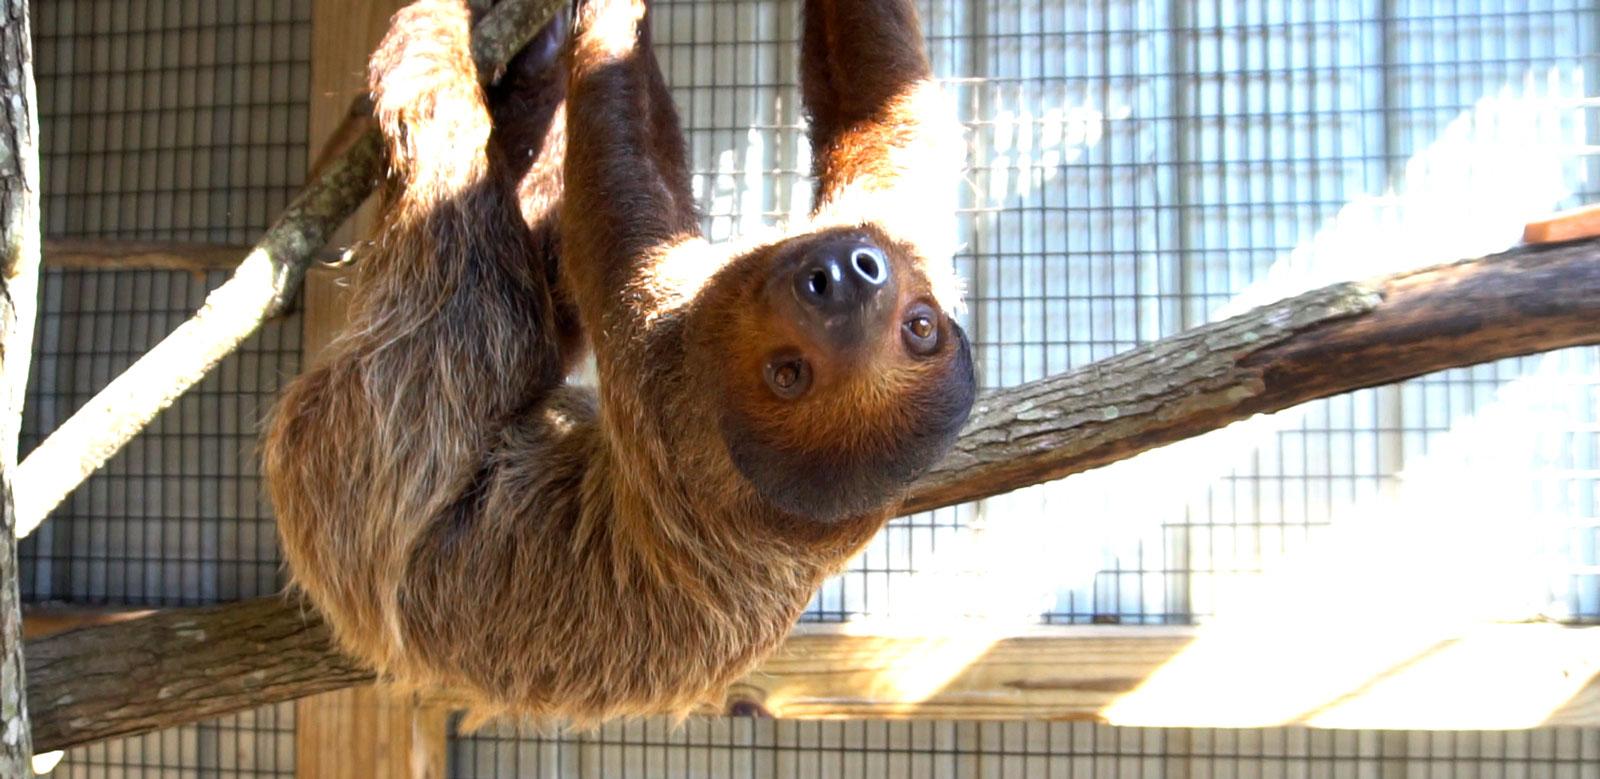 Pet a Sloth at Zoo World Panama City Beach